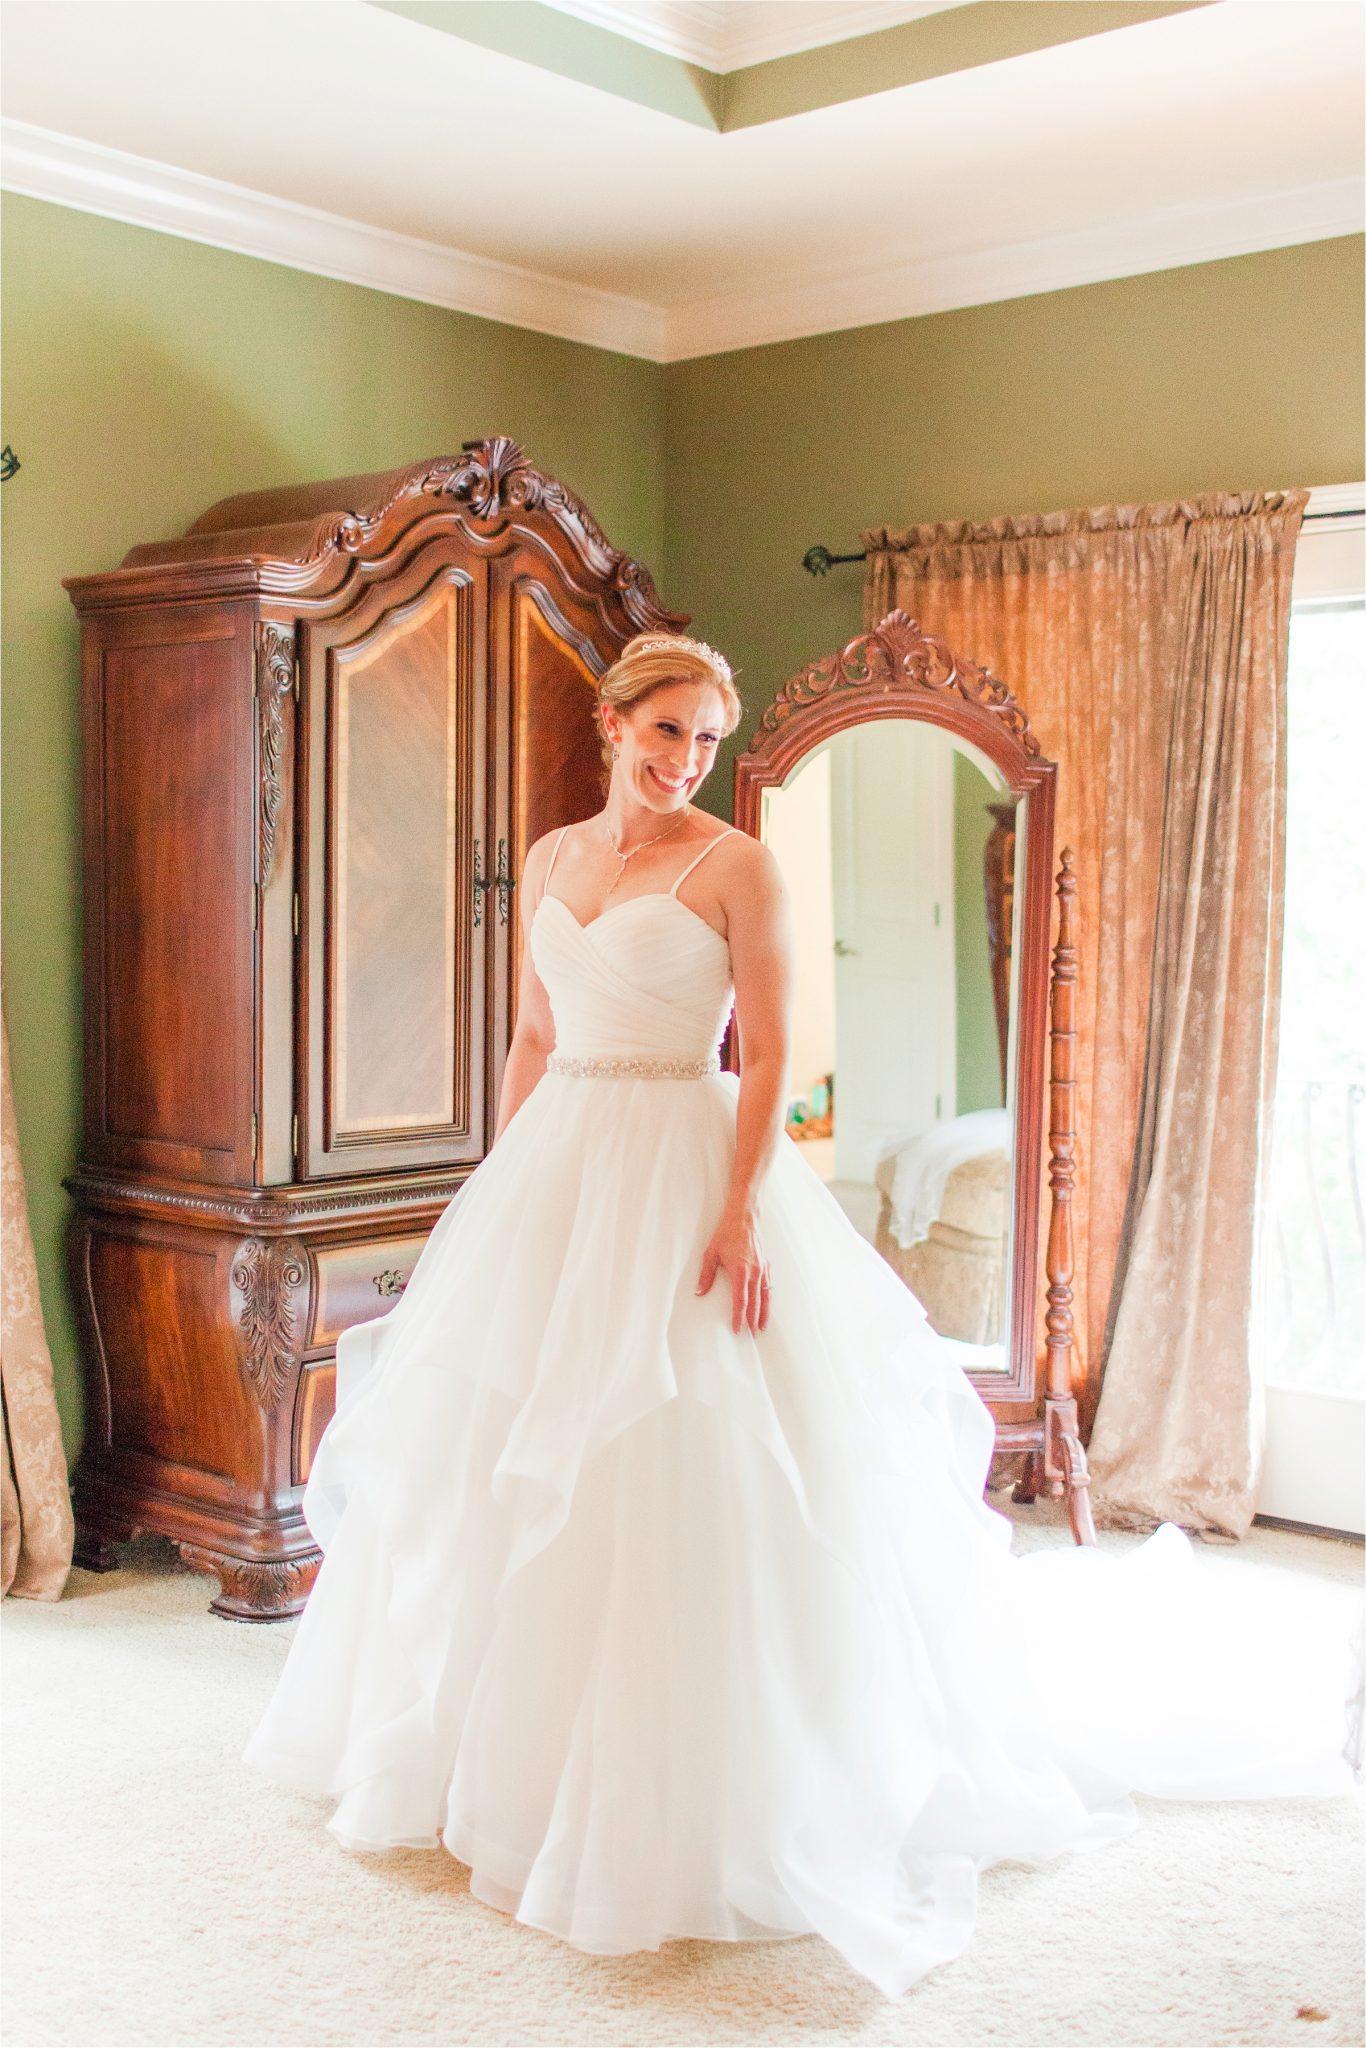 Romantic Destination Wedding Photographer-Bella Sera Gardens-Sarra + Matt-Bridal photography-Wedding dress-First look